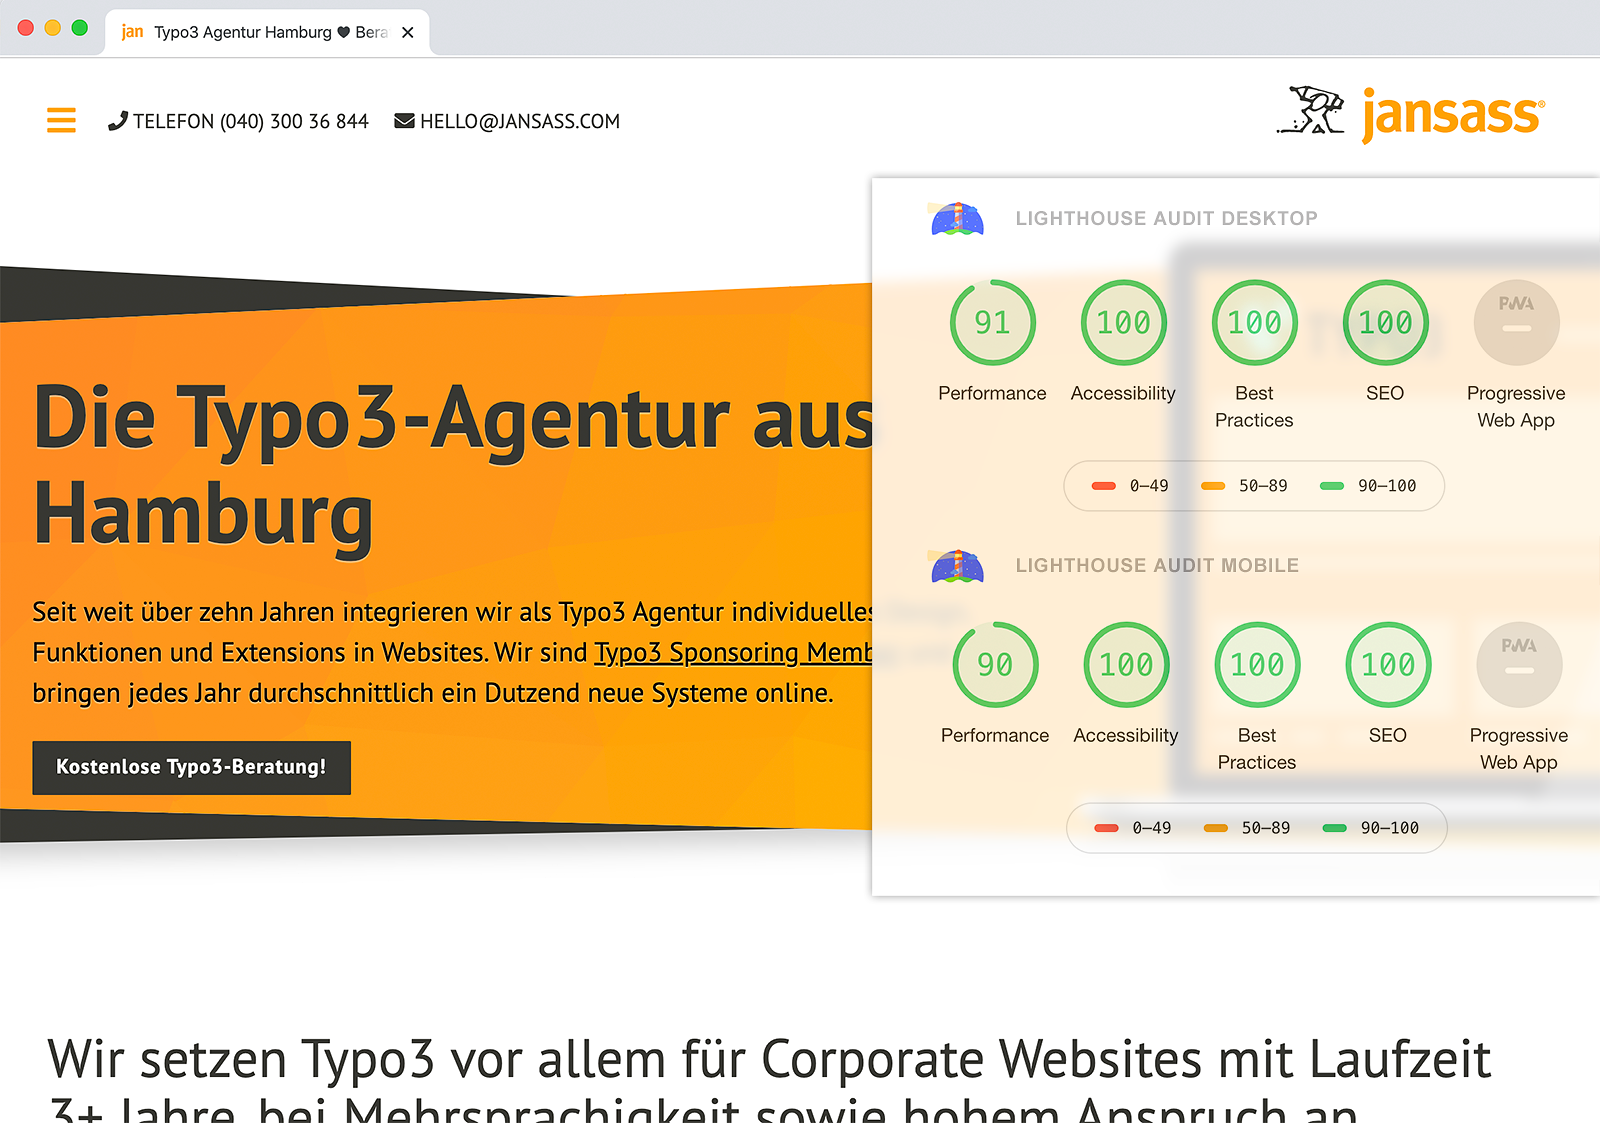 Typo3 Speed + SEO-Optimierung mit Lighthouse Audits